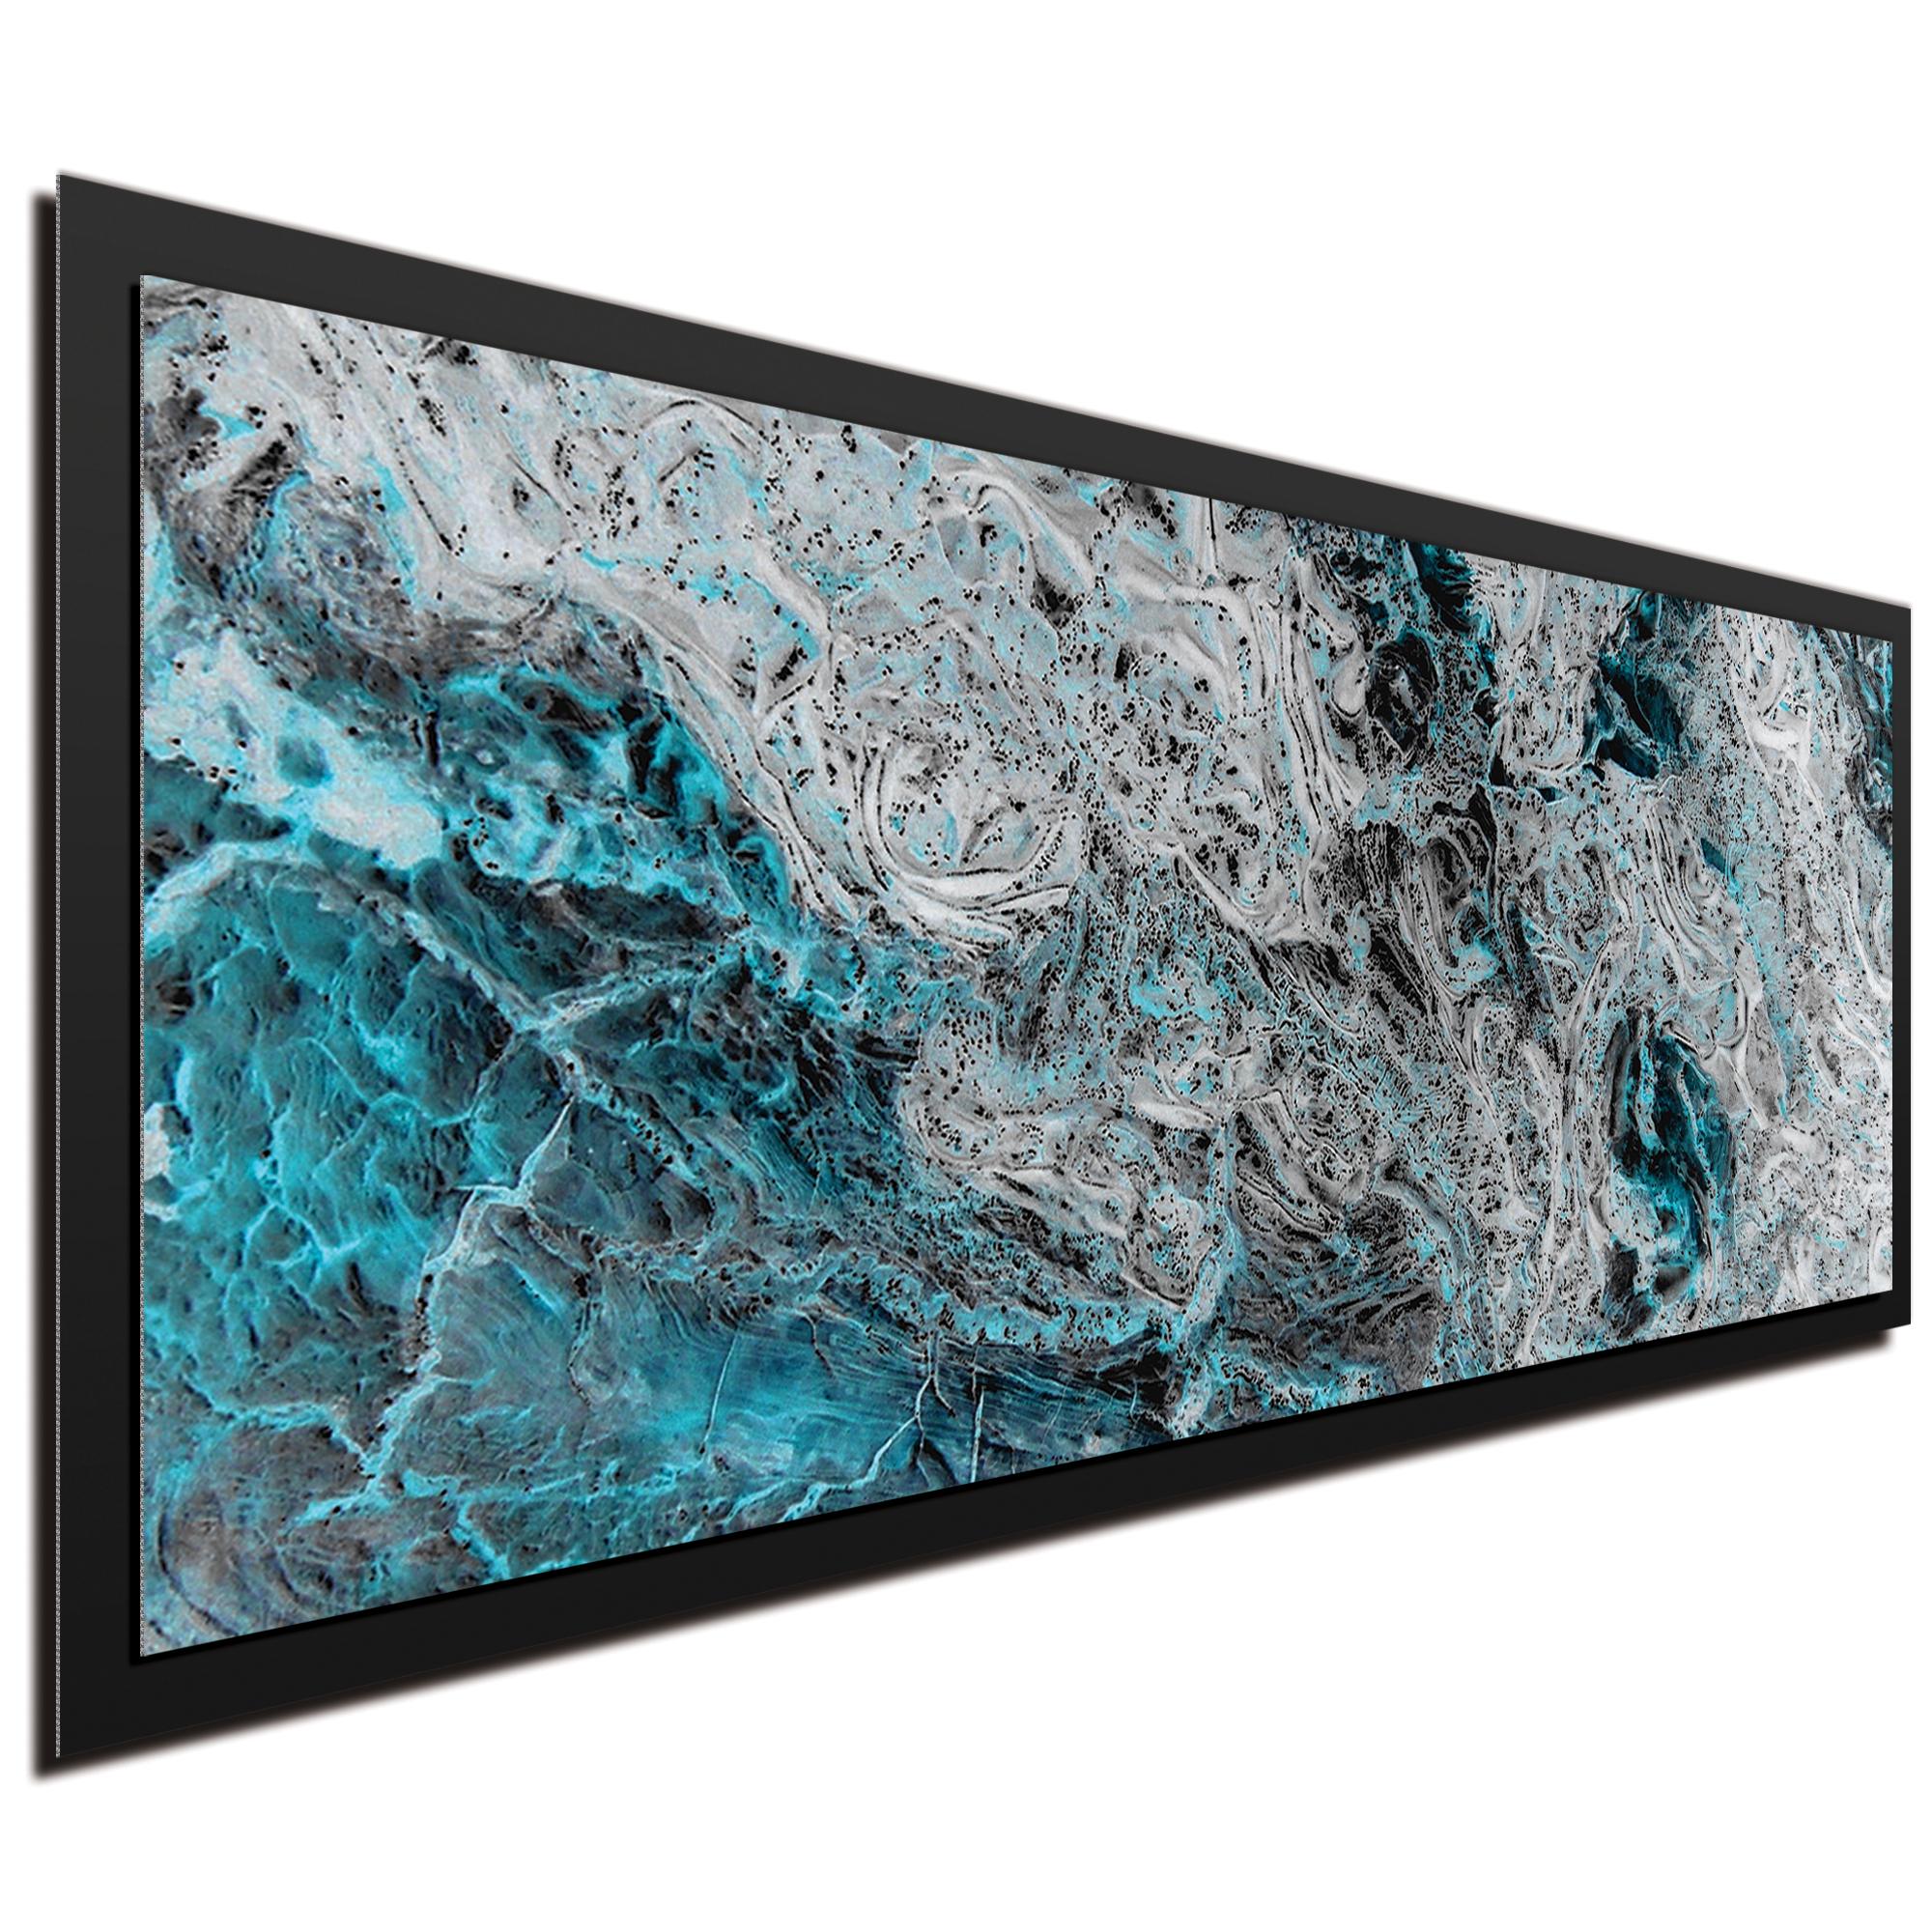 Storm Turquoise Framed - Image 2